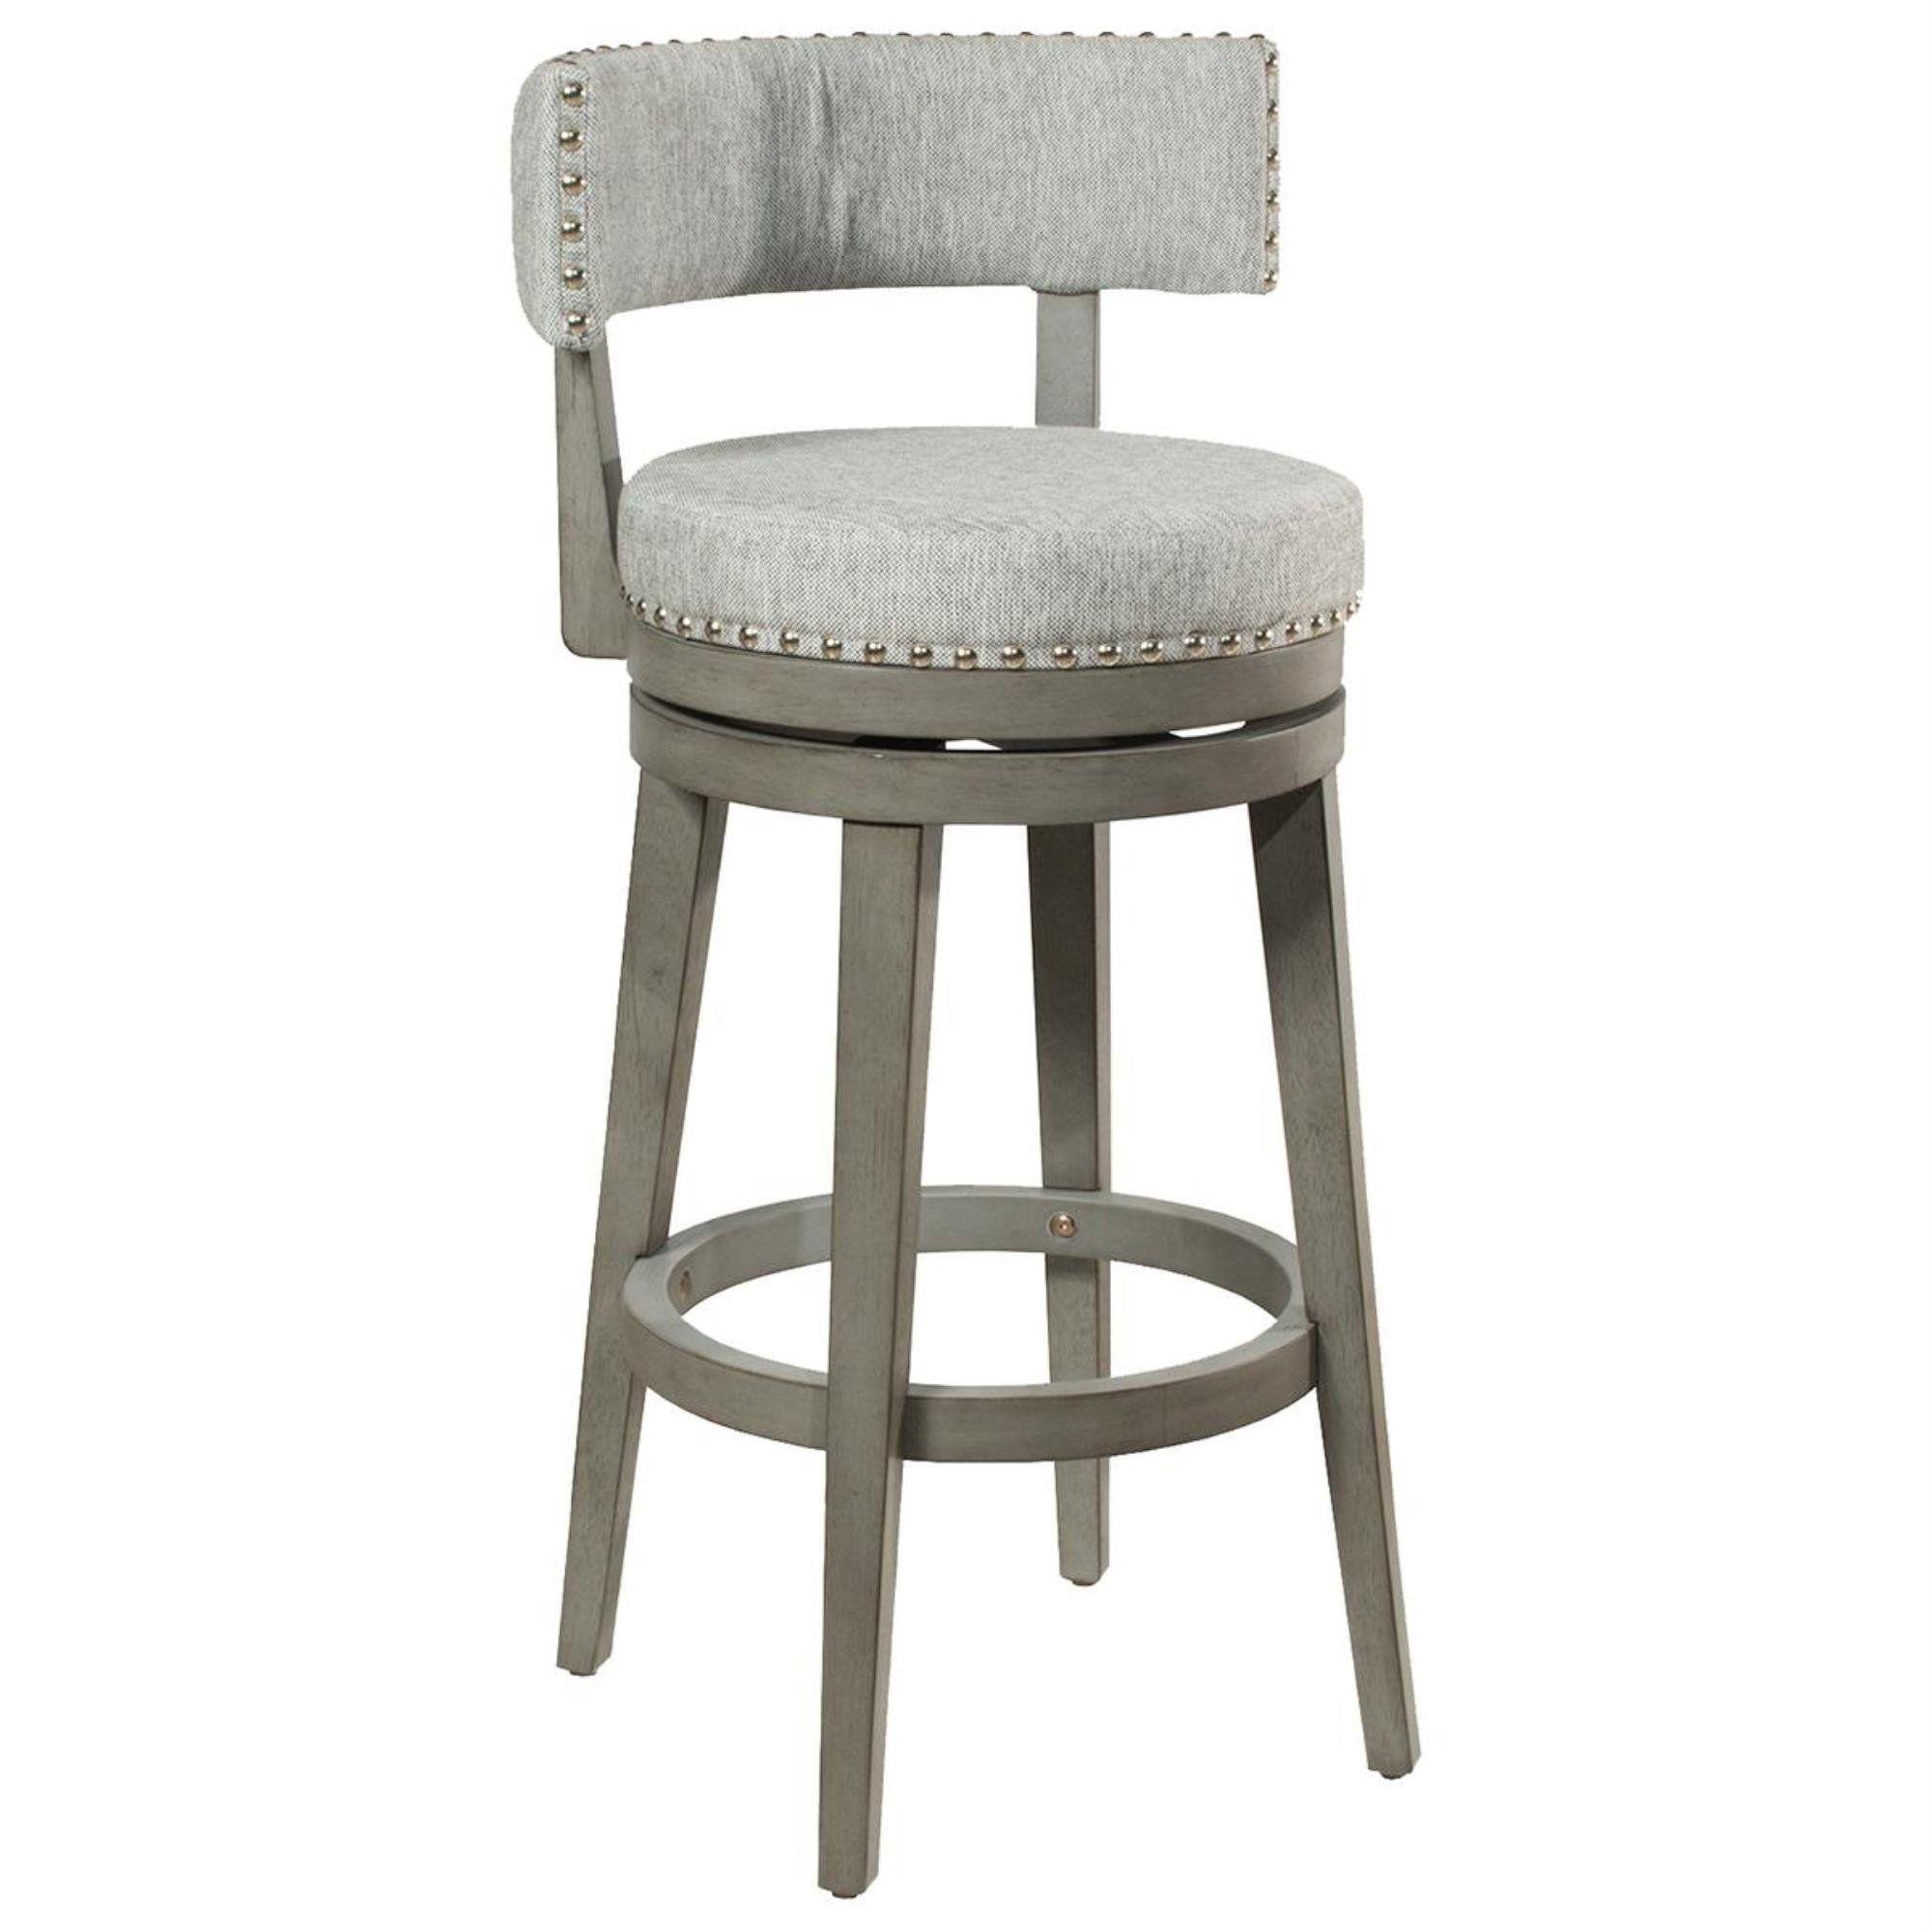 Fnrmznz8stl3um Grey wood bar stools